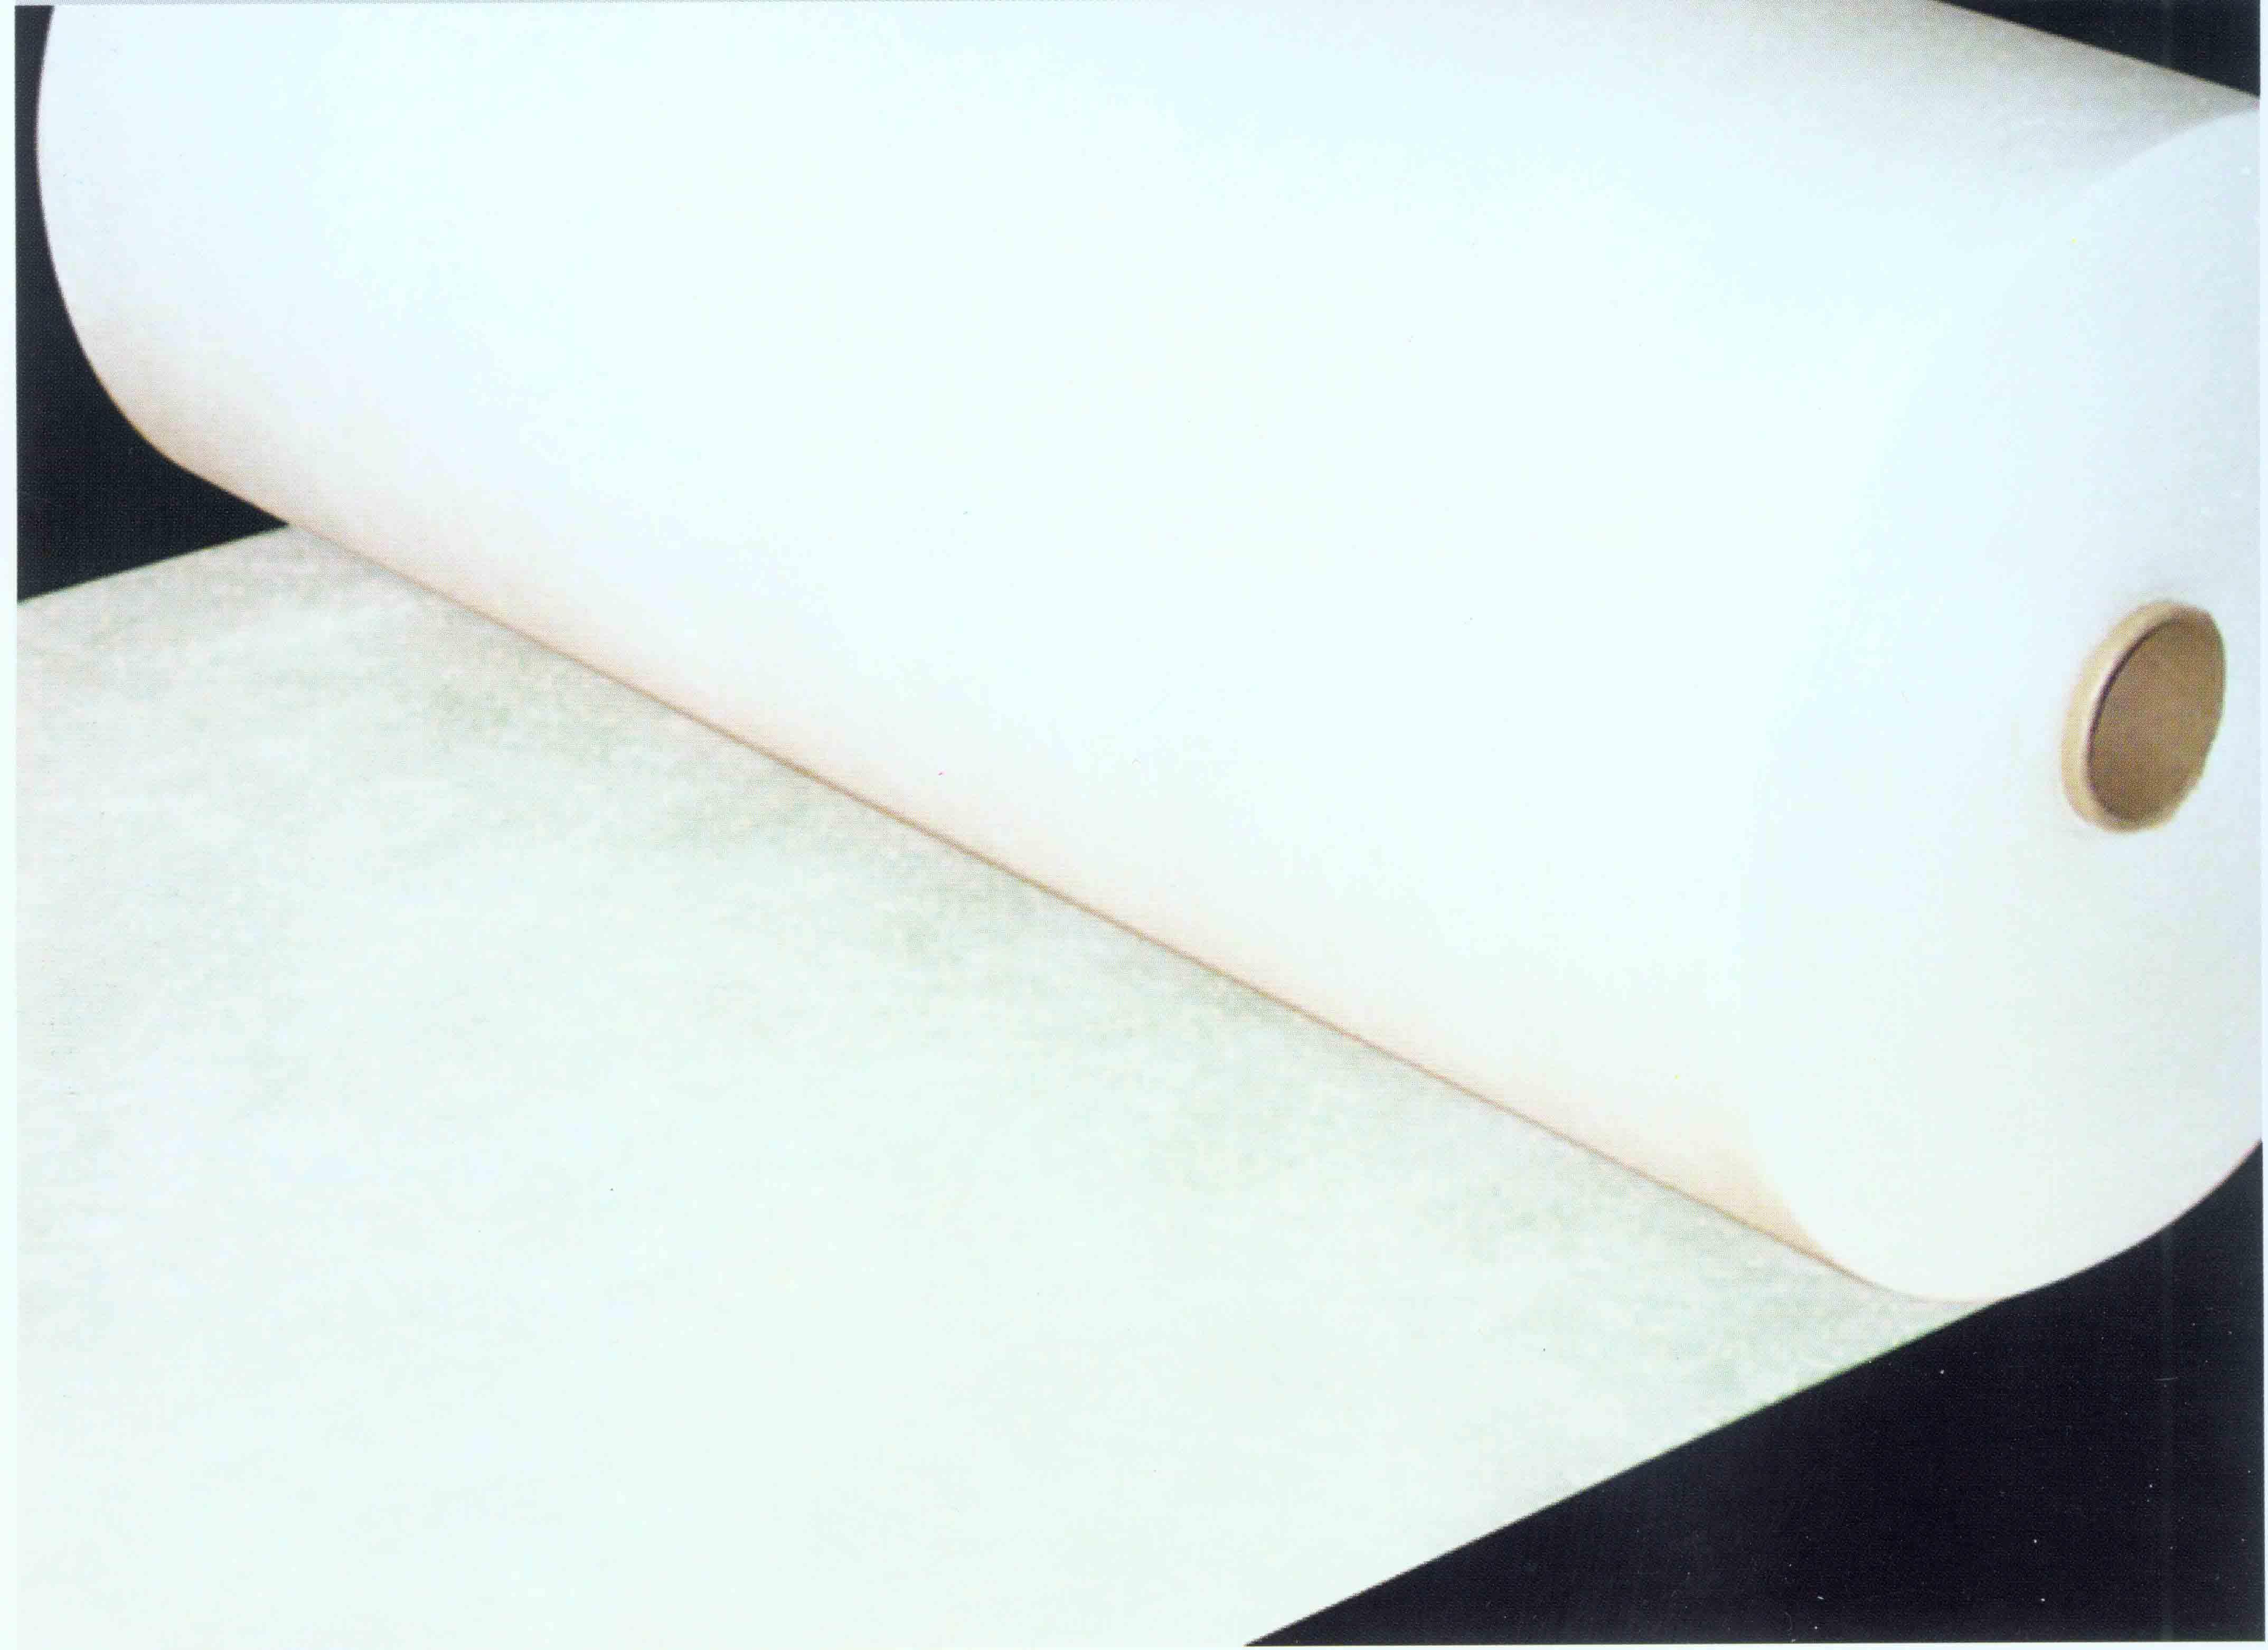 Fibra de vidrio tissue papel de vidrio para suelos de - Papel para vidrios ...